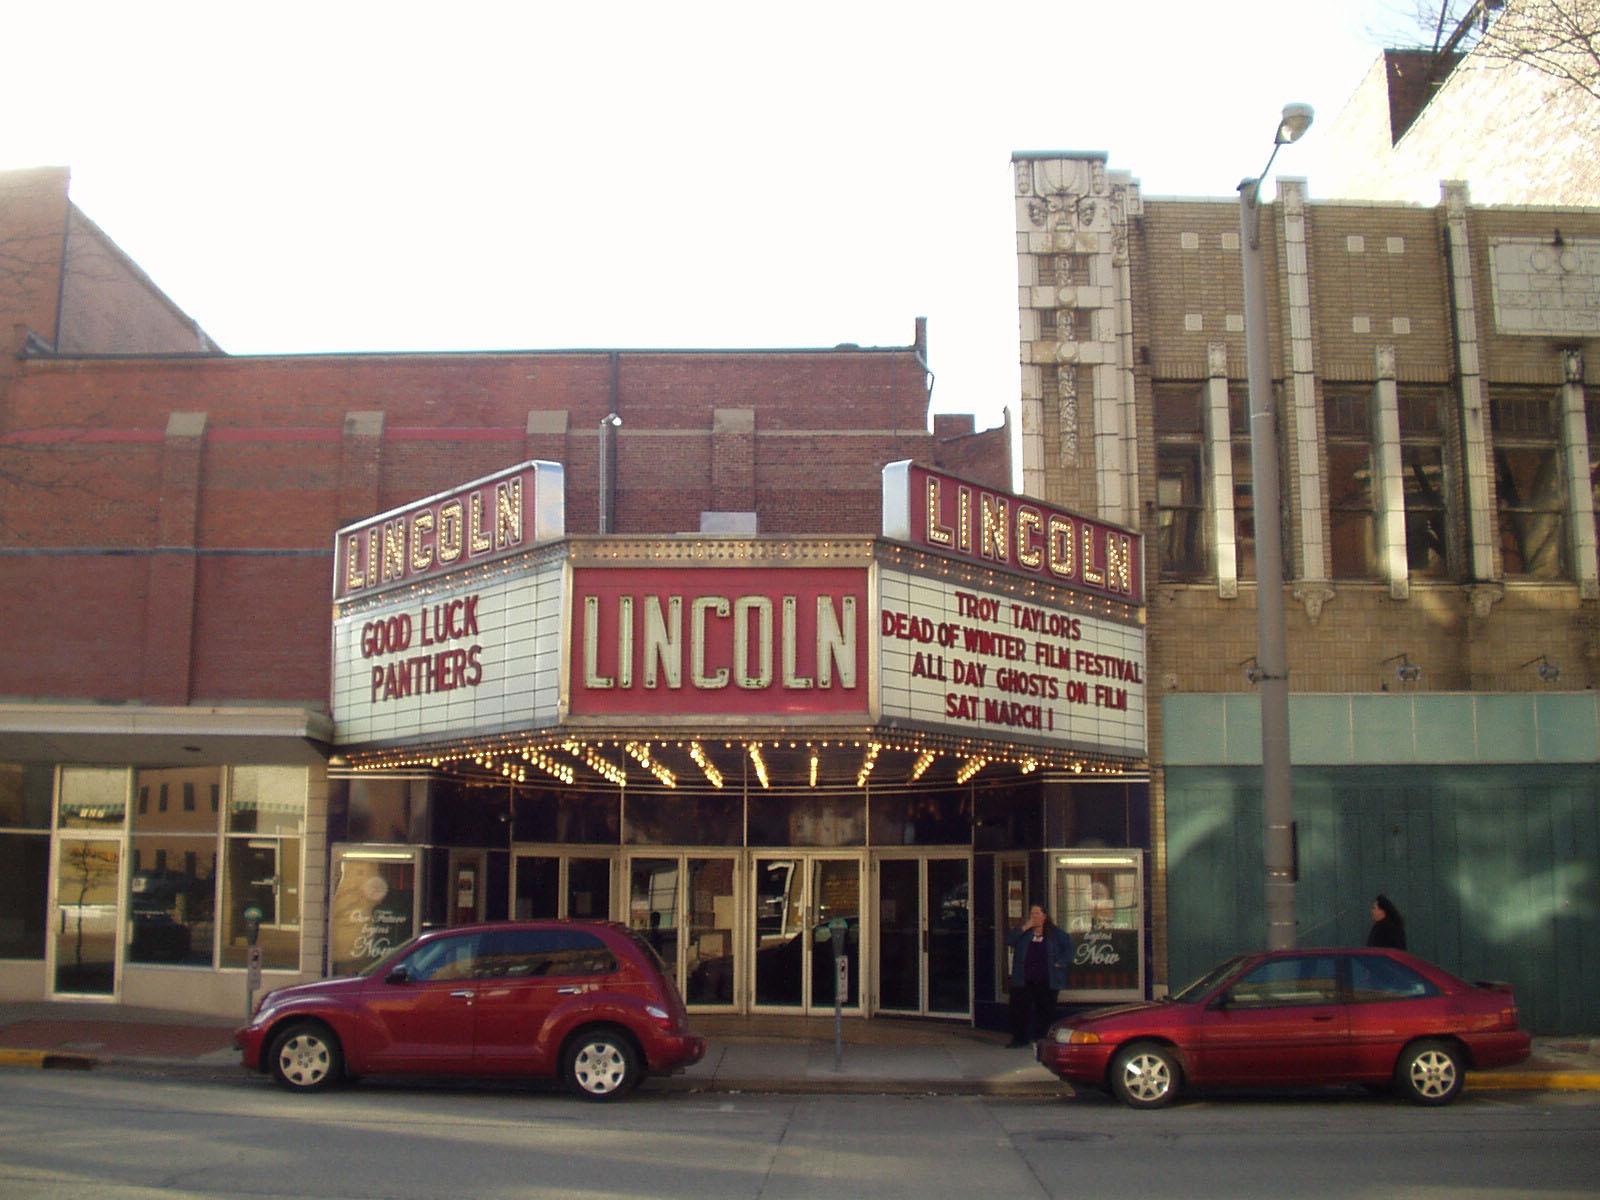 Lincoln Theater in Decatur, Illinois